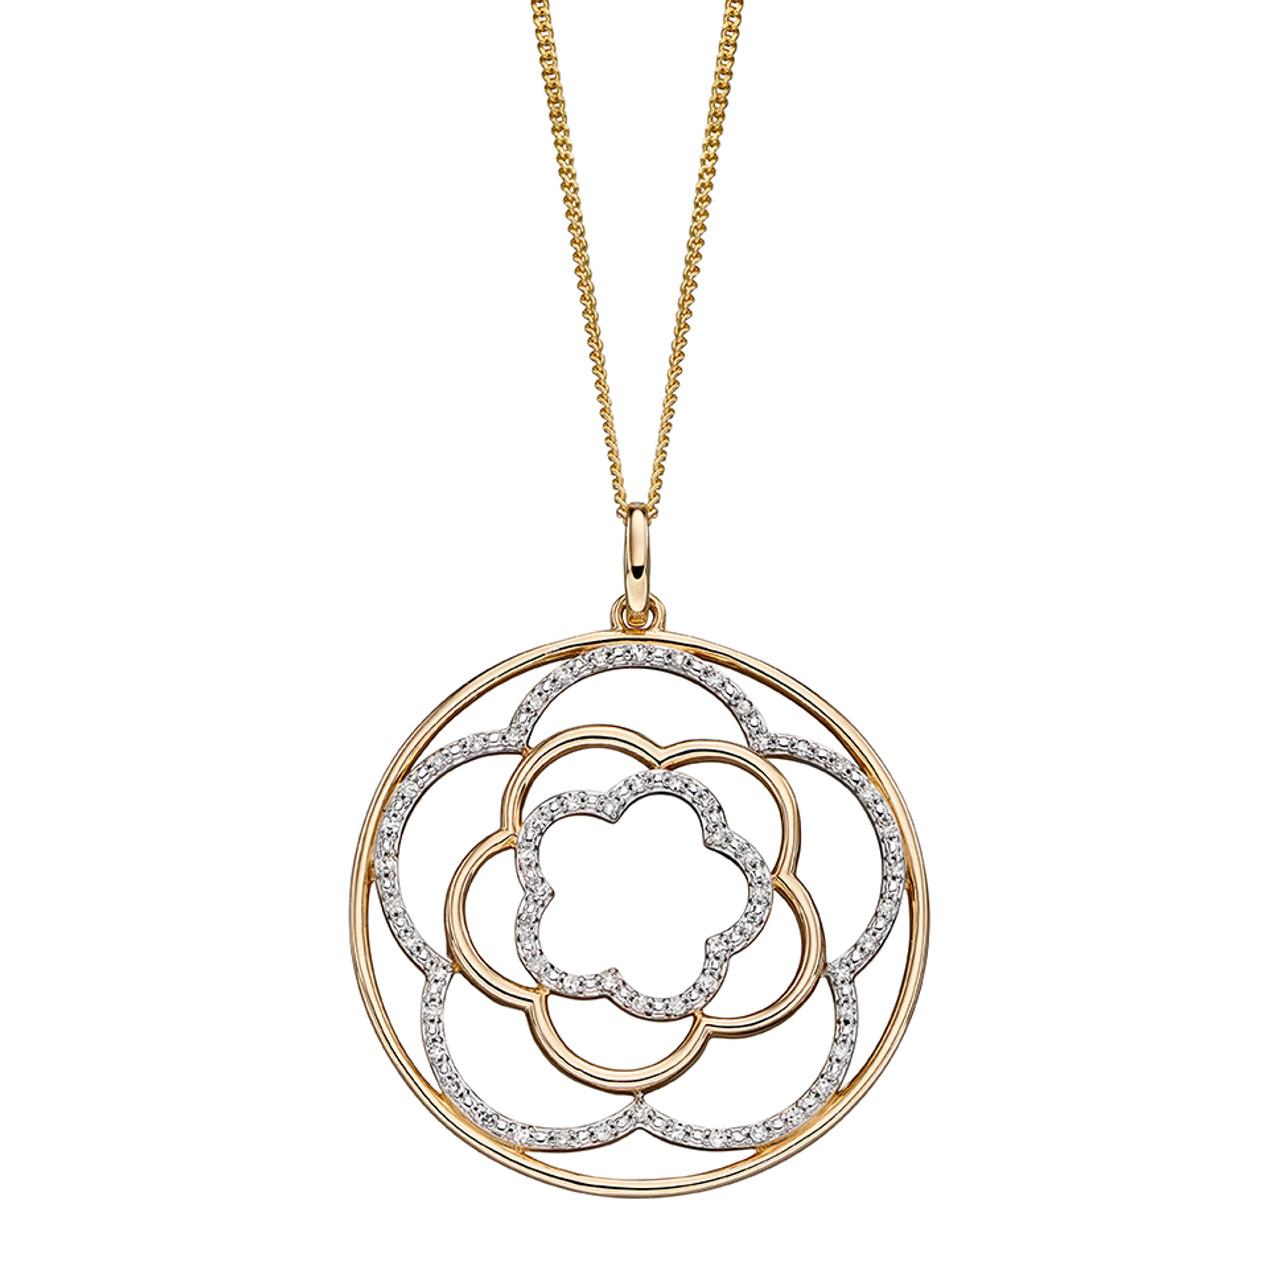 9ct Yellow Gold & Diamond Flower Pendant on Chain